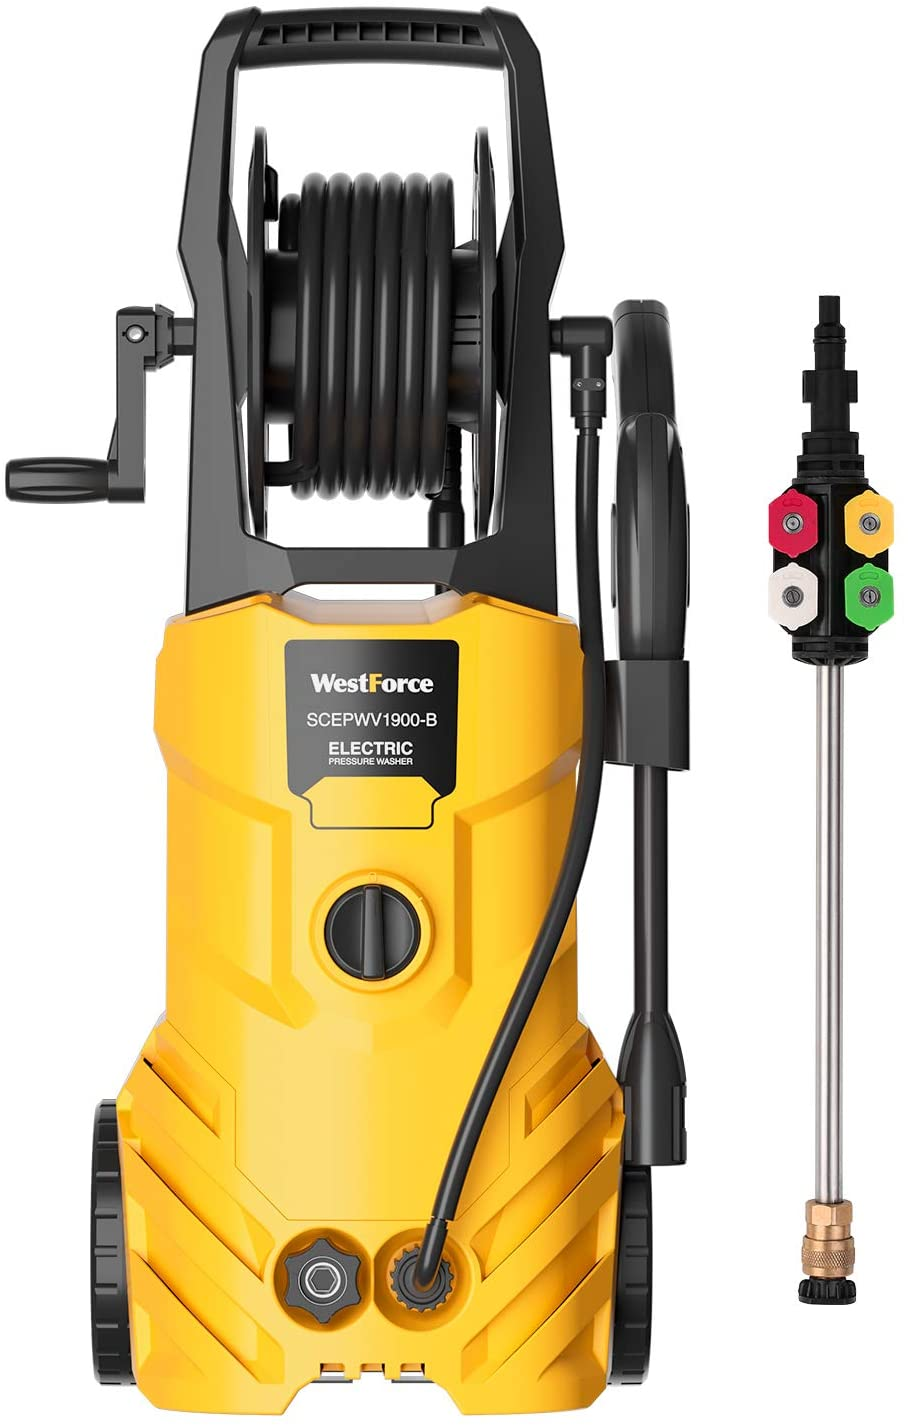 WestForce Electric Pressure Washer